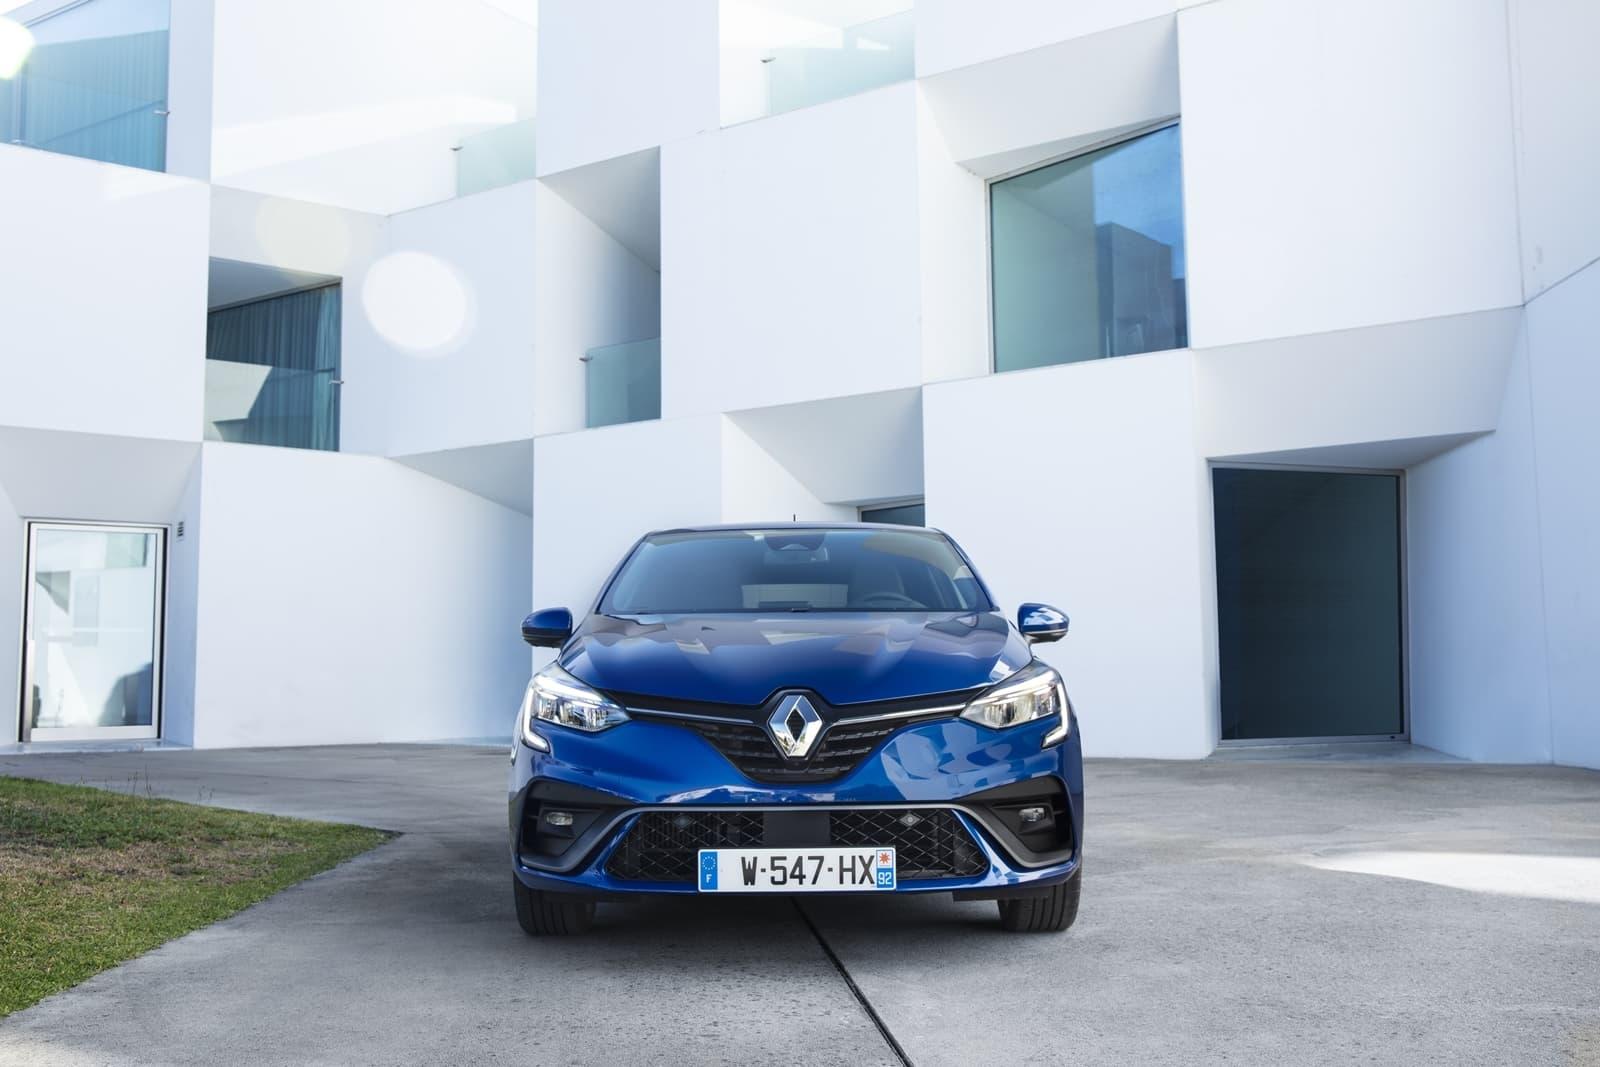 Renault Clio 2020 Prueba 0619 031